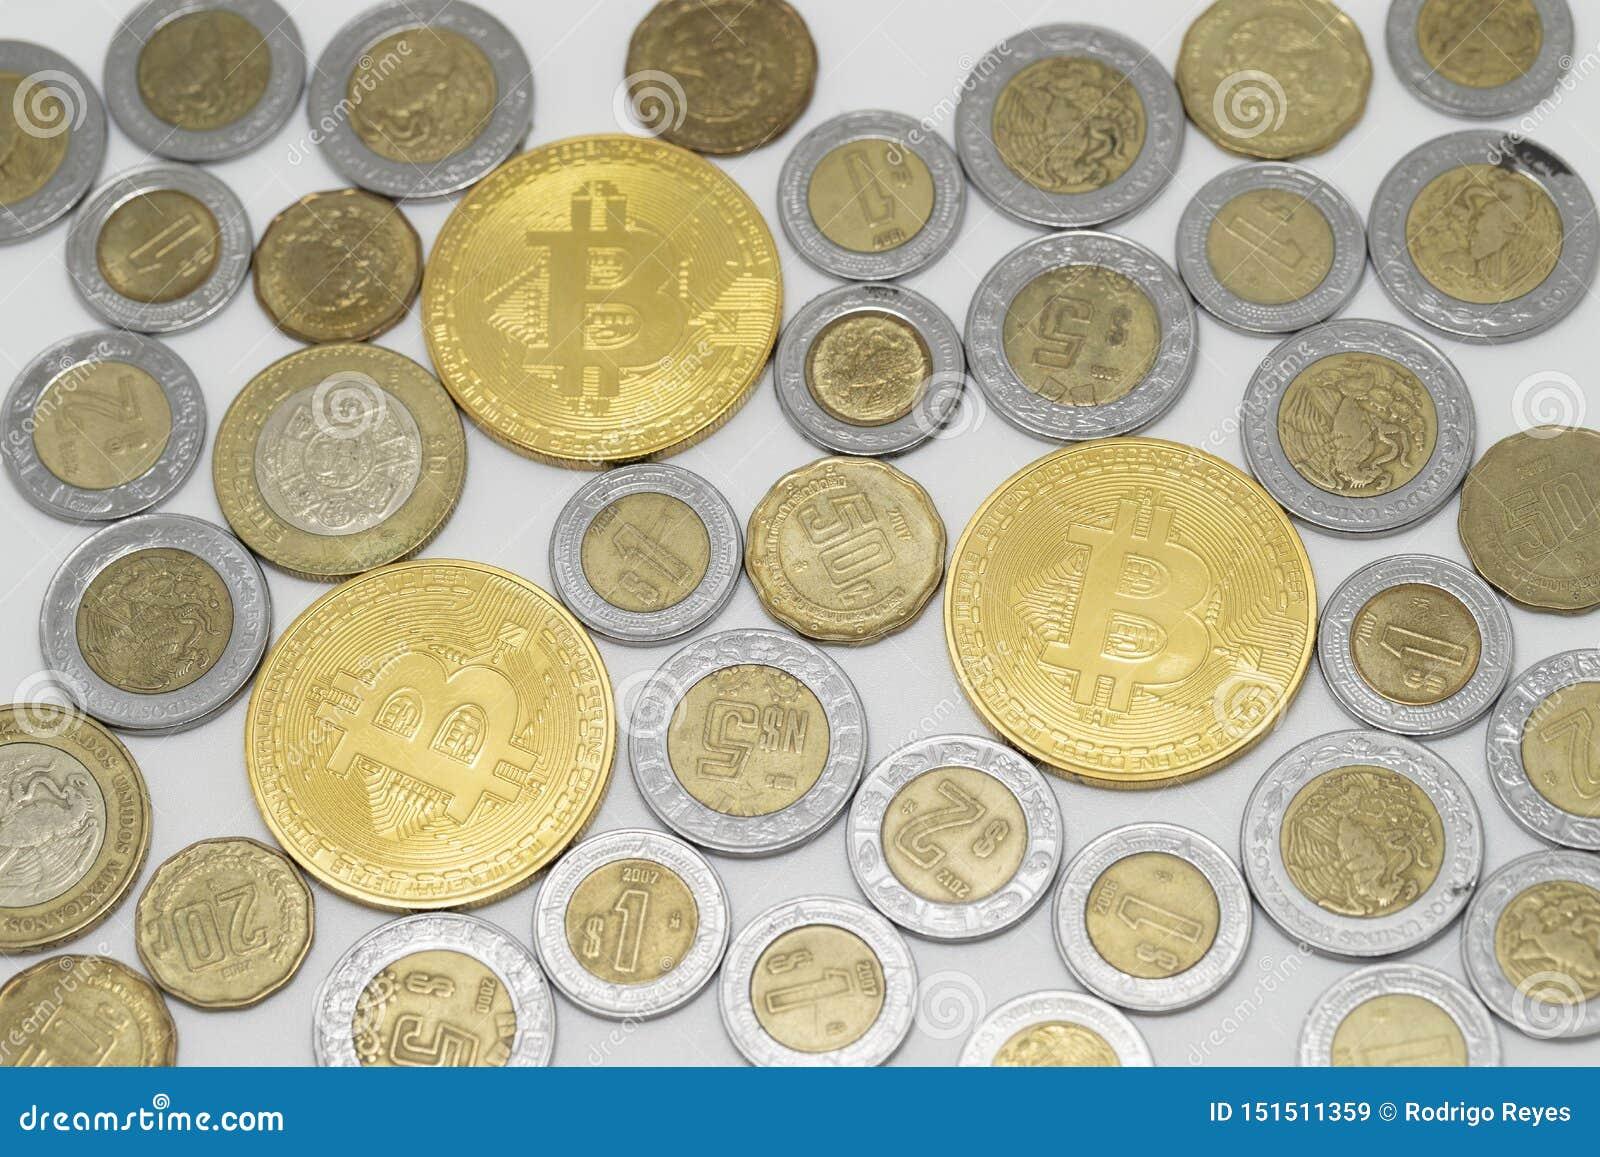 money coin price